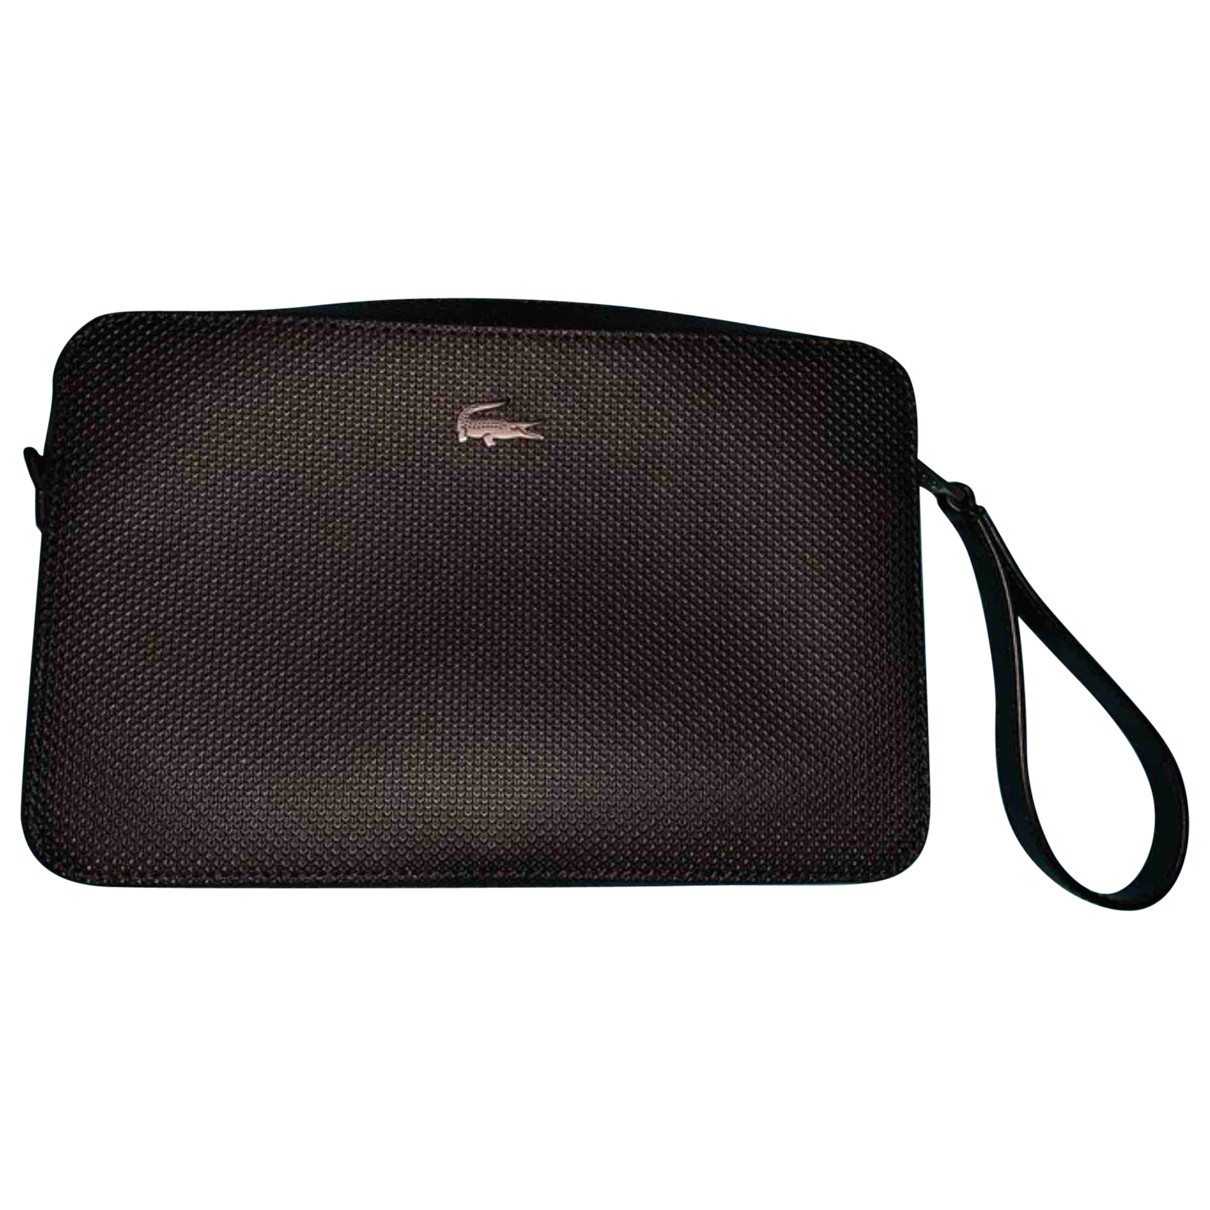 Lacoste \N Black Leather Small bag, wallet & cases for Men \N